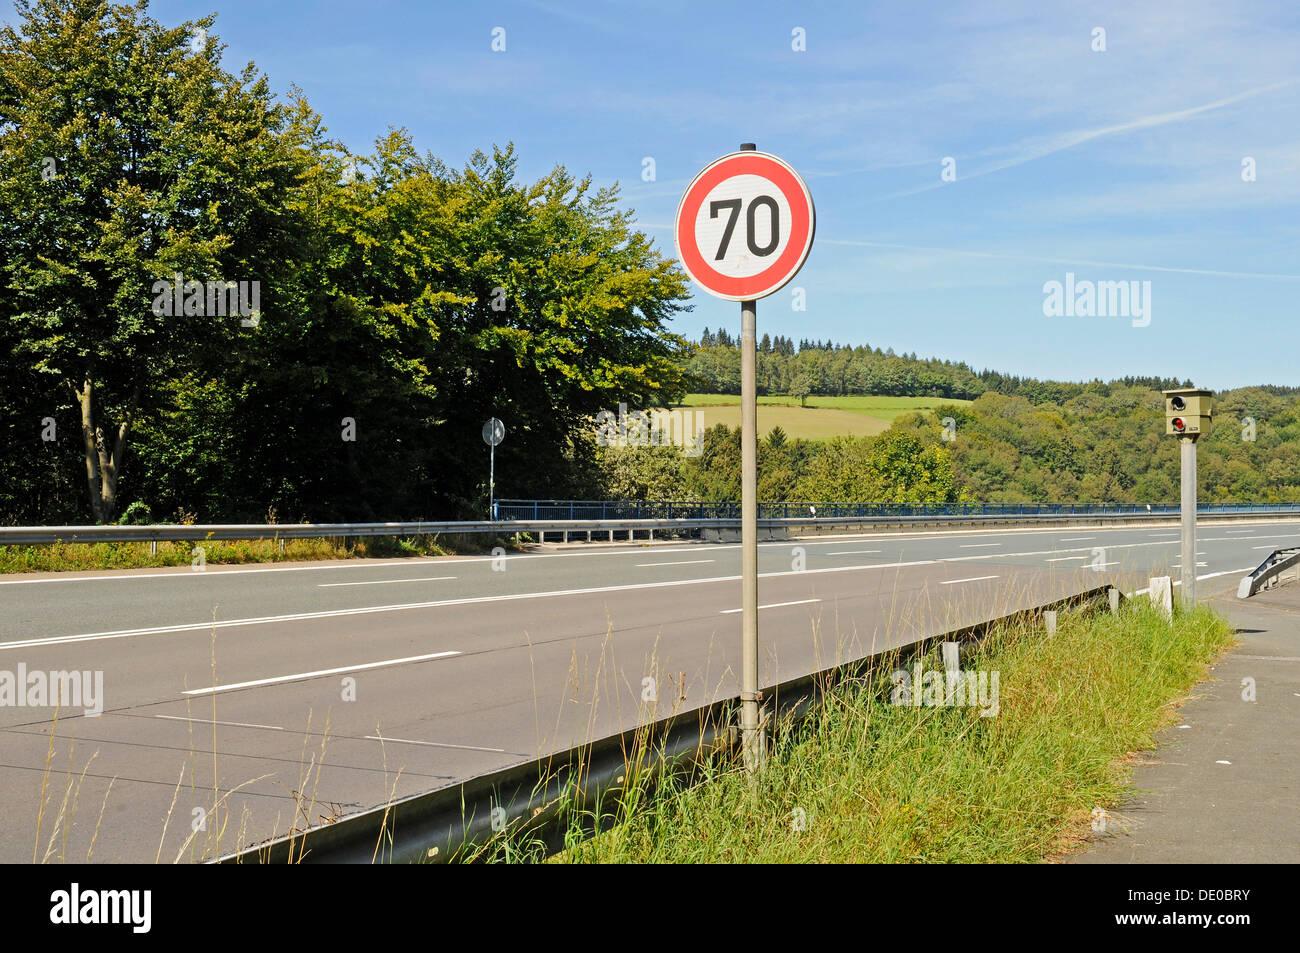 Traffic sign, 70 kmh speed limit, Speed limit enforcement, traffic control, country road, Talbruecke Ronnewinkel bridge, Olpe Stock Photo